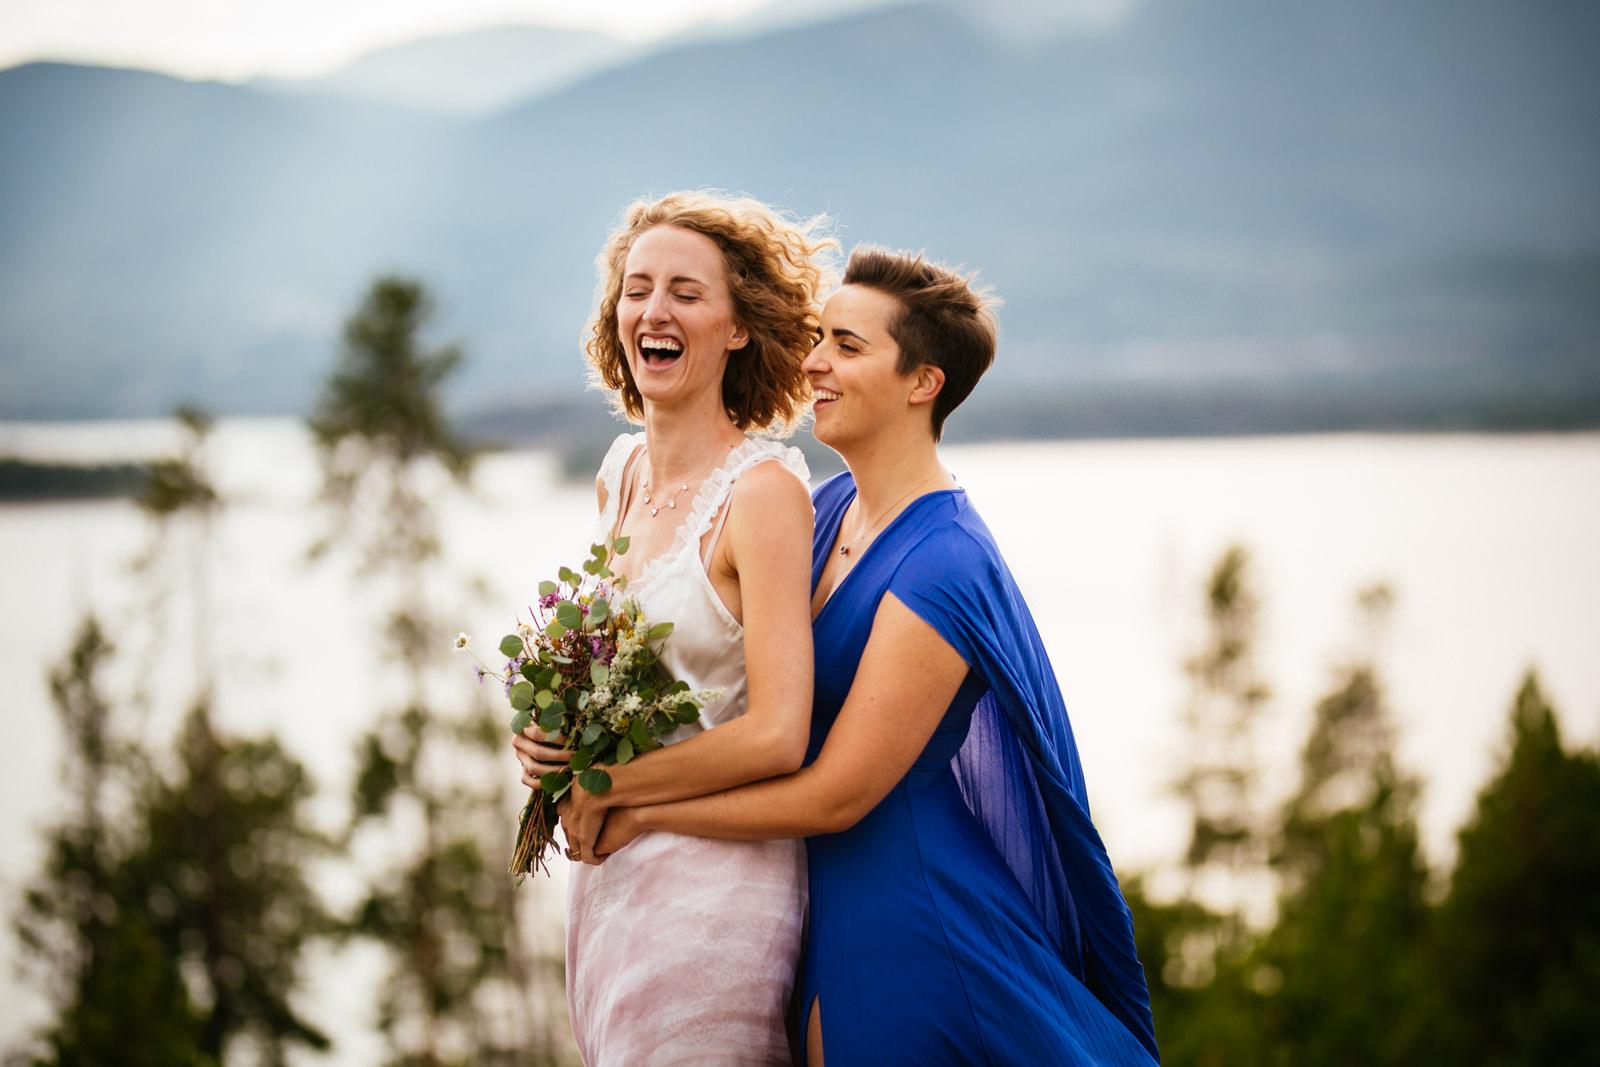 Colorado-Wedding-Photographer (6 of 8).jpg